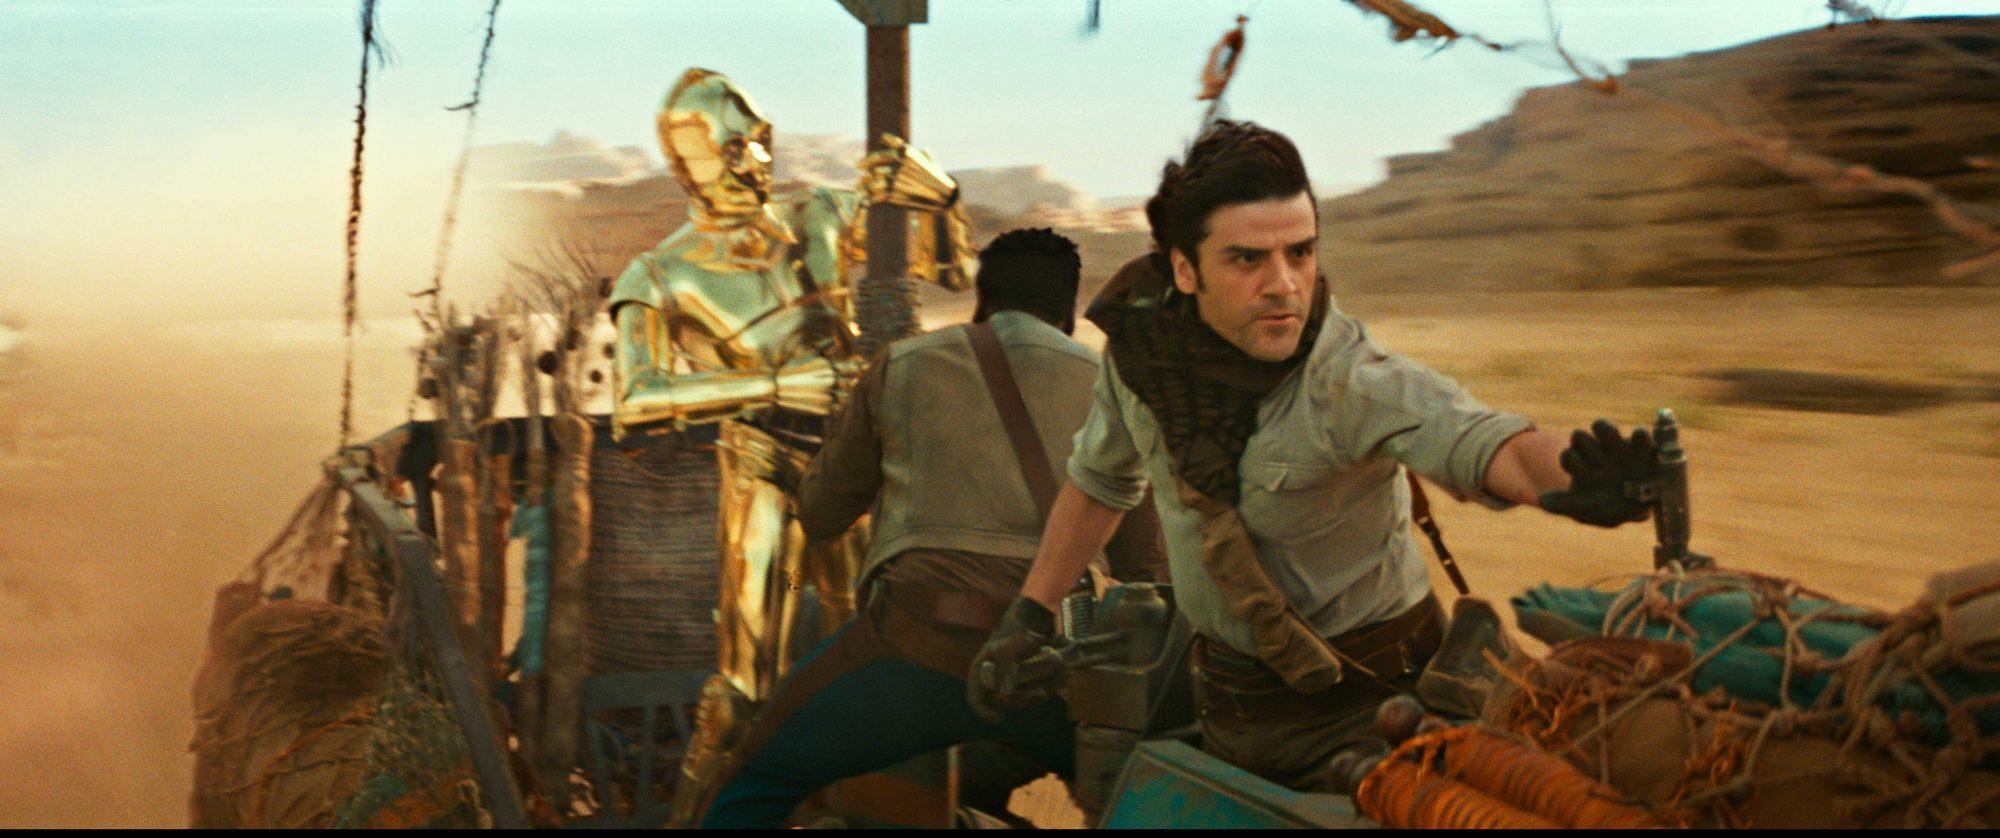 Oscar Isaac - Star Wars - Hot List - 2 - December 2019/January 2020